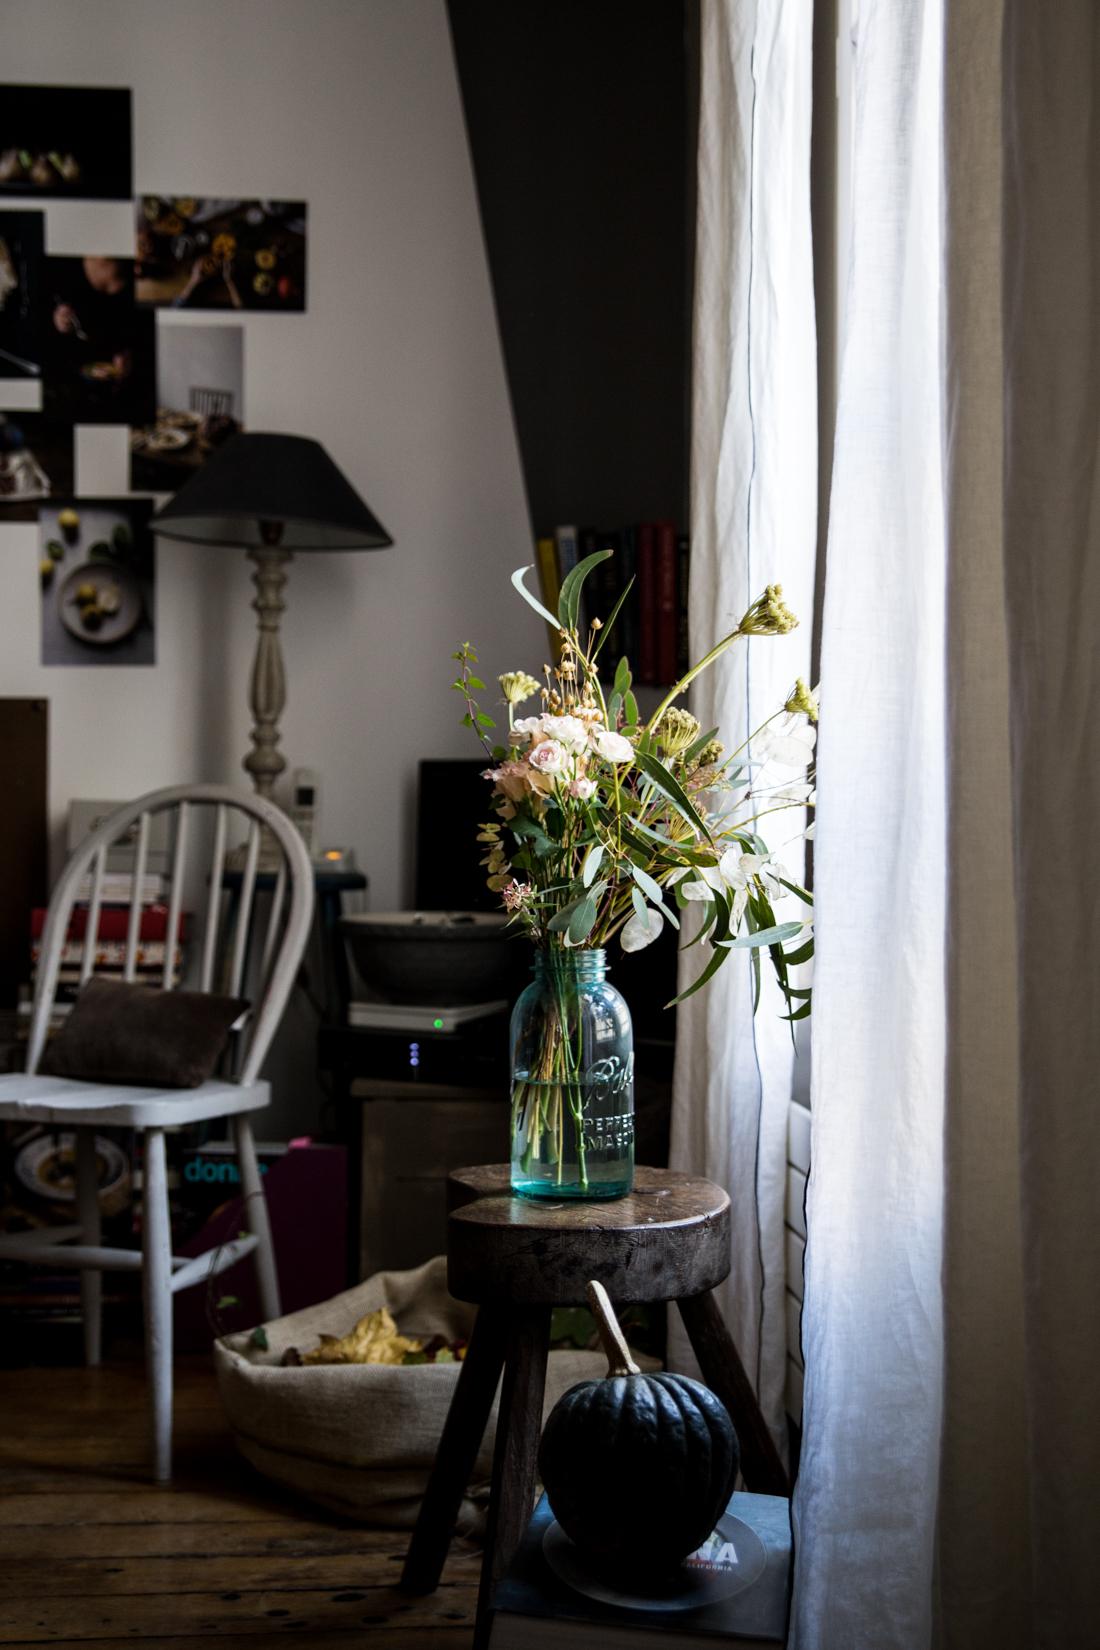 appartement-montmartre-ophelie-lauret-ophelies-kitchen-book